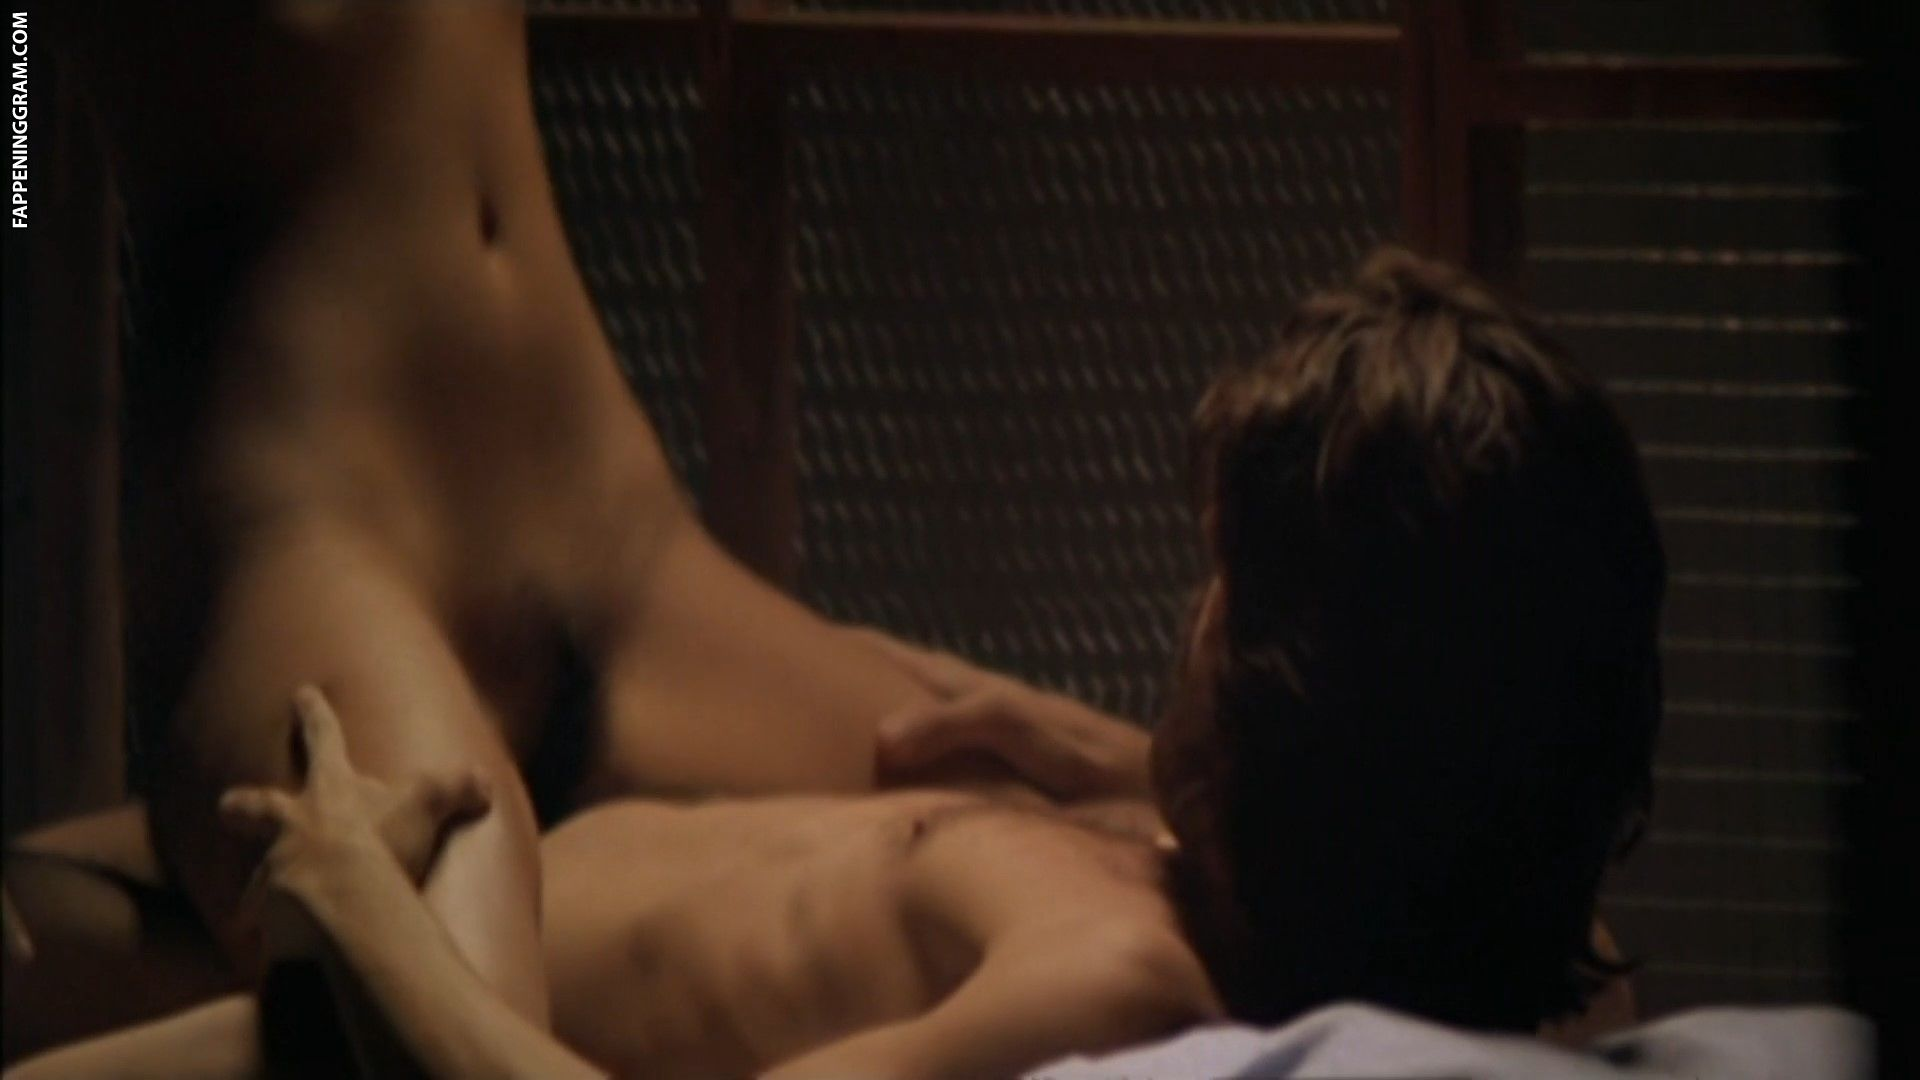 Melanie chartoff nudes